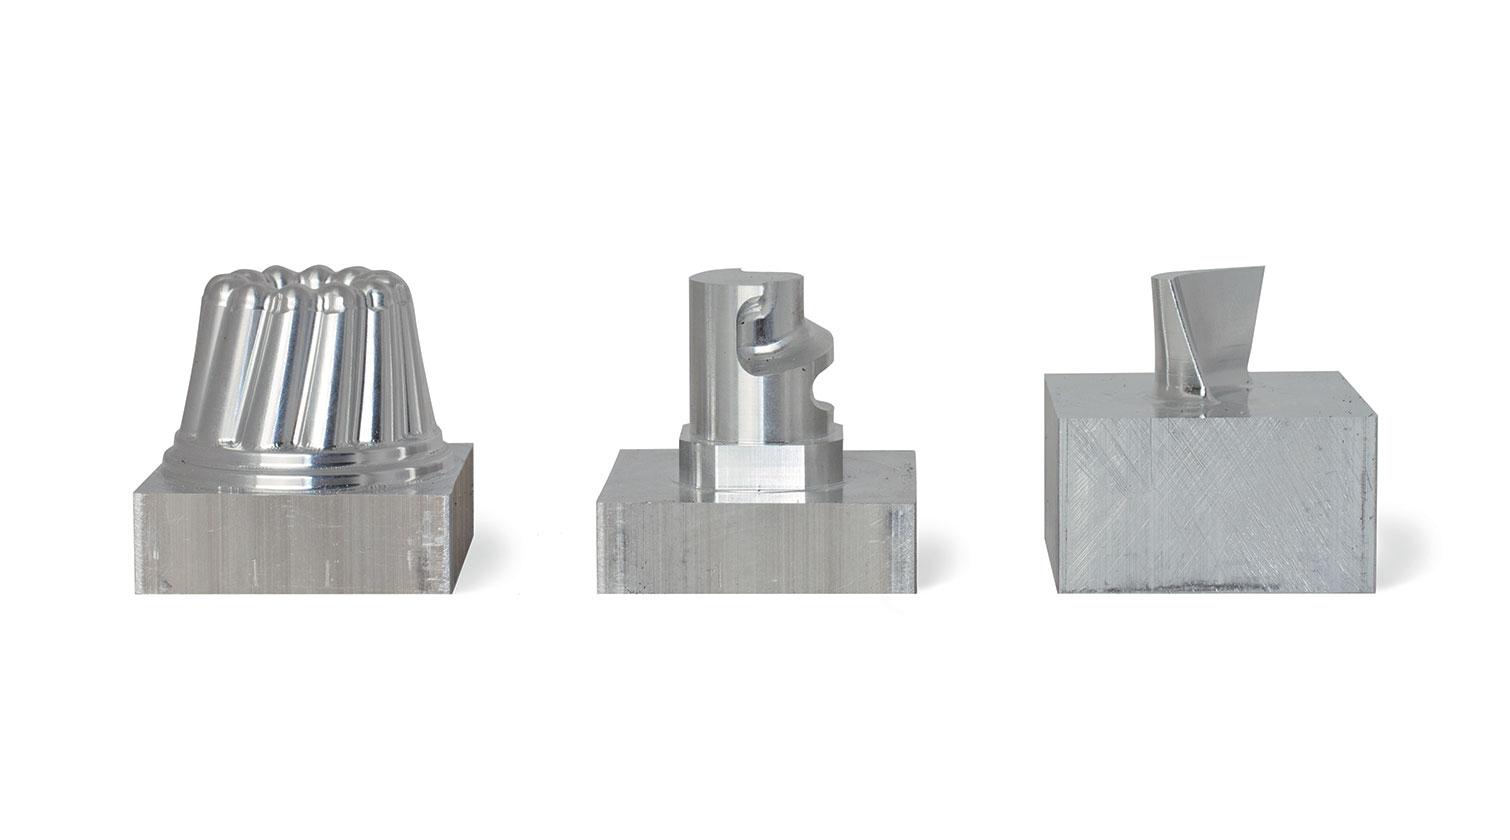 INT micro milling rapid prototyping CNC Imes Icore Premium 4030µ sample 2